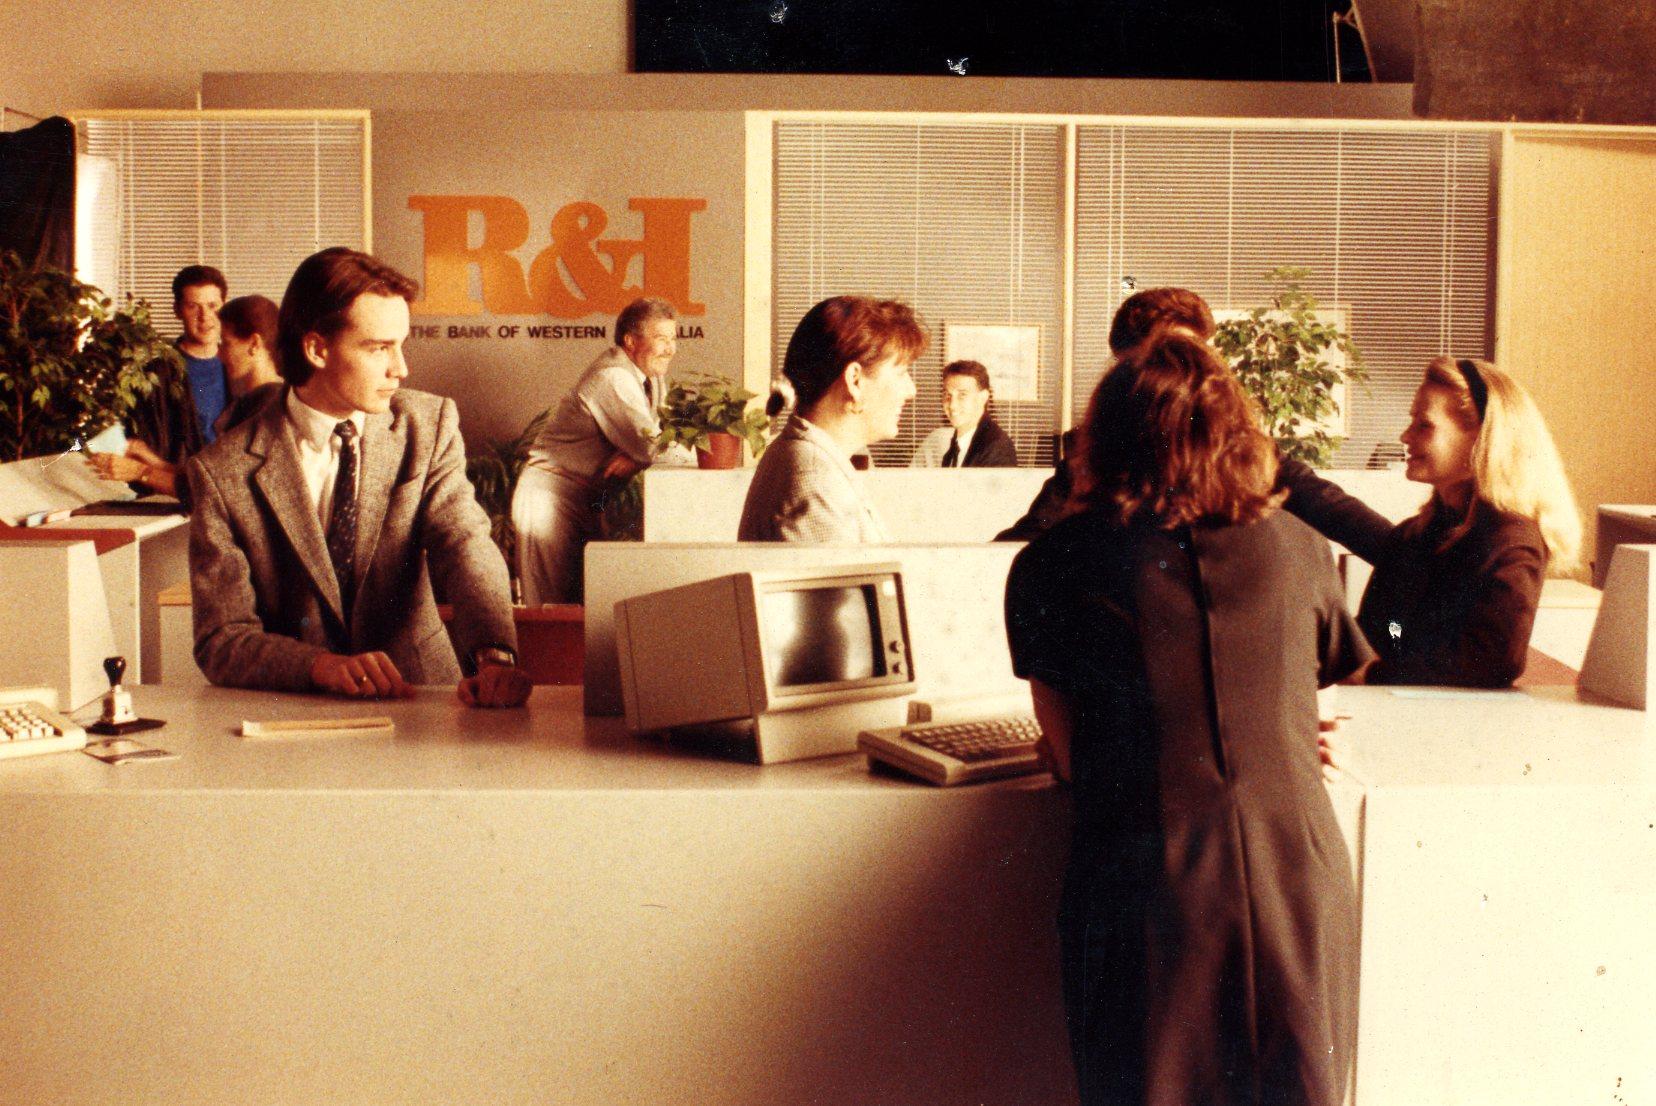 R&I Bank282.jpg